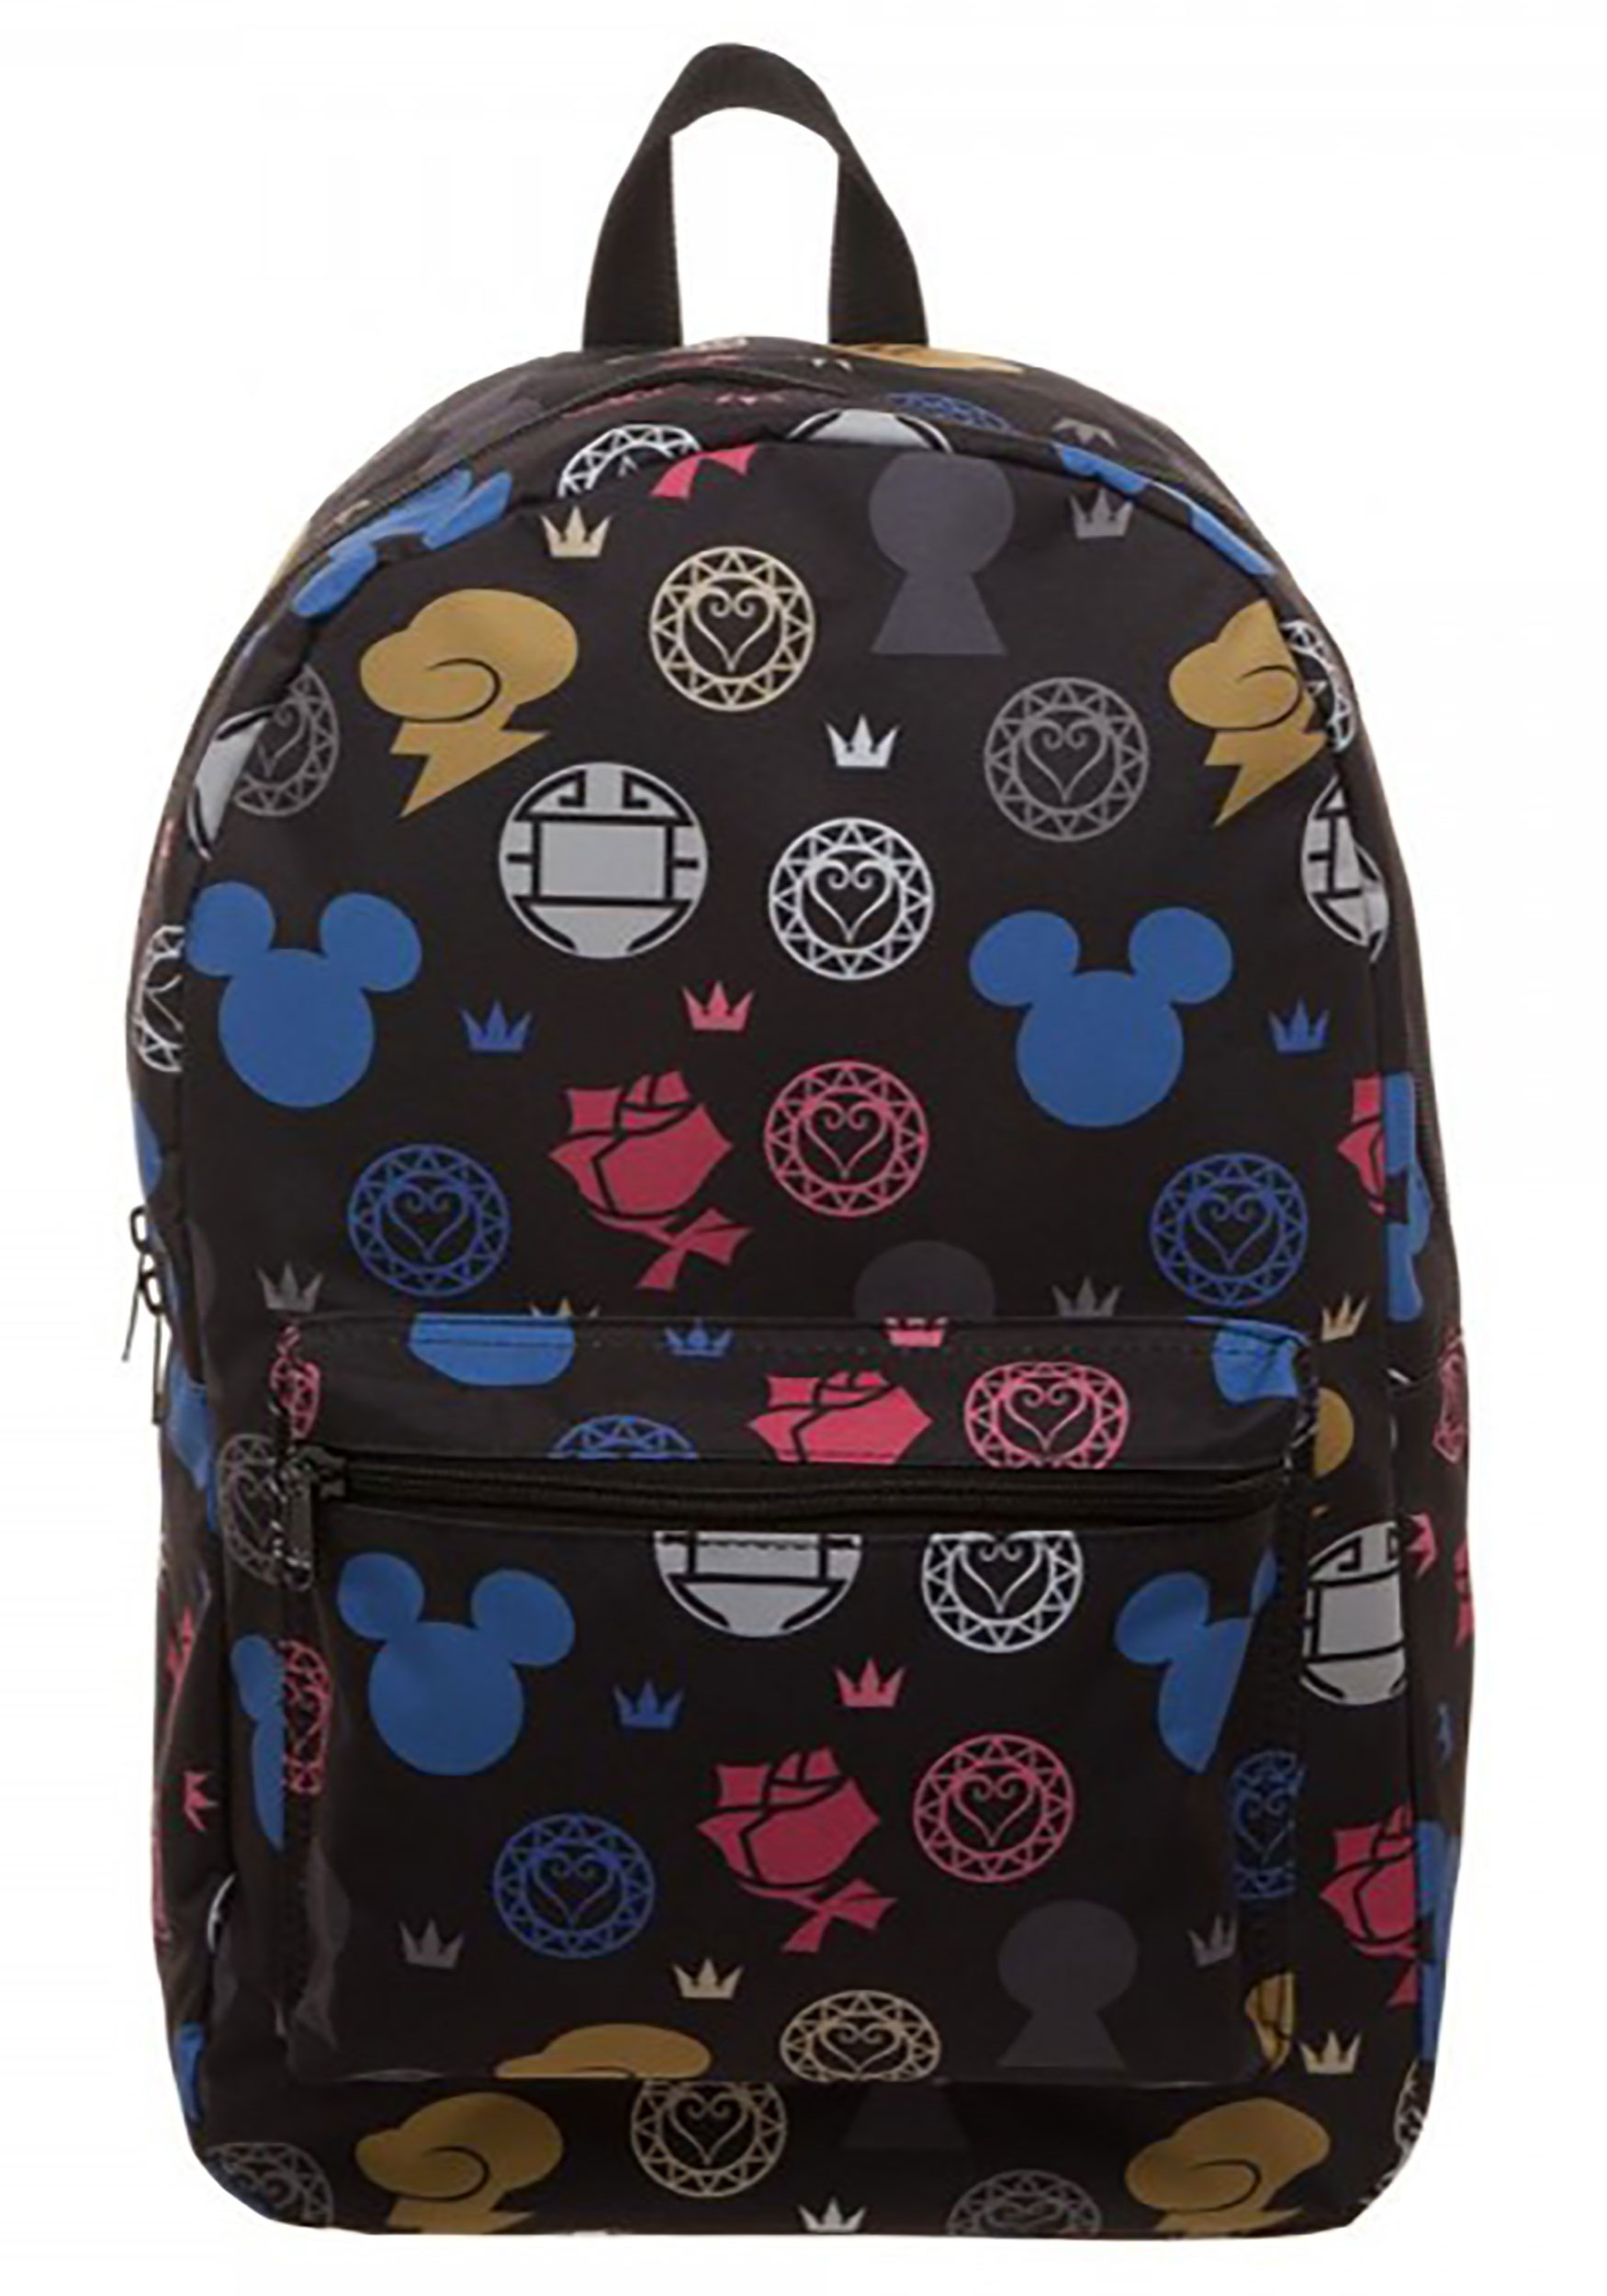 b9bd6f03a Hot Special Savings  Kingdom Hearts Symbols All Over Print Backpack ...